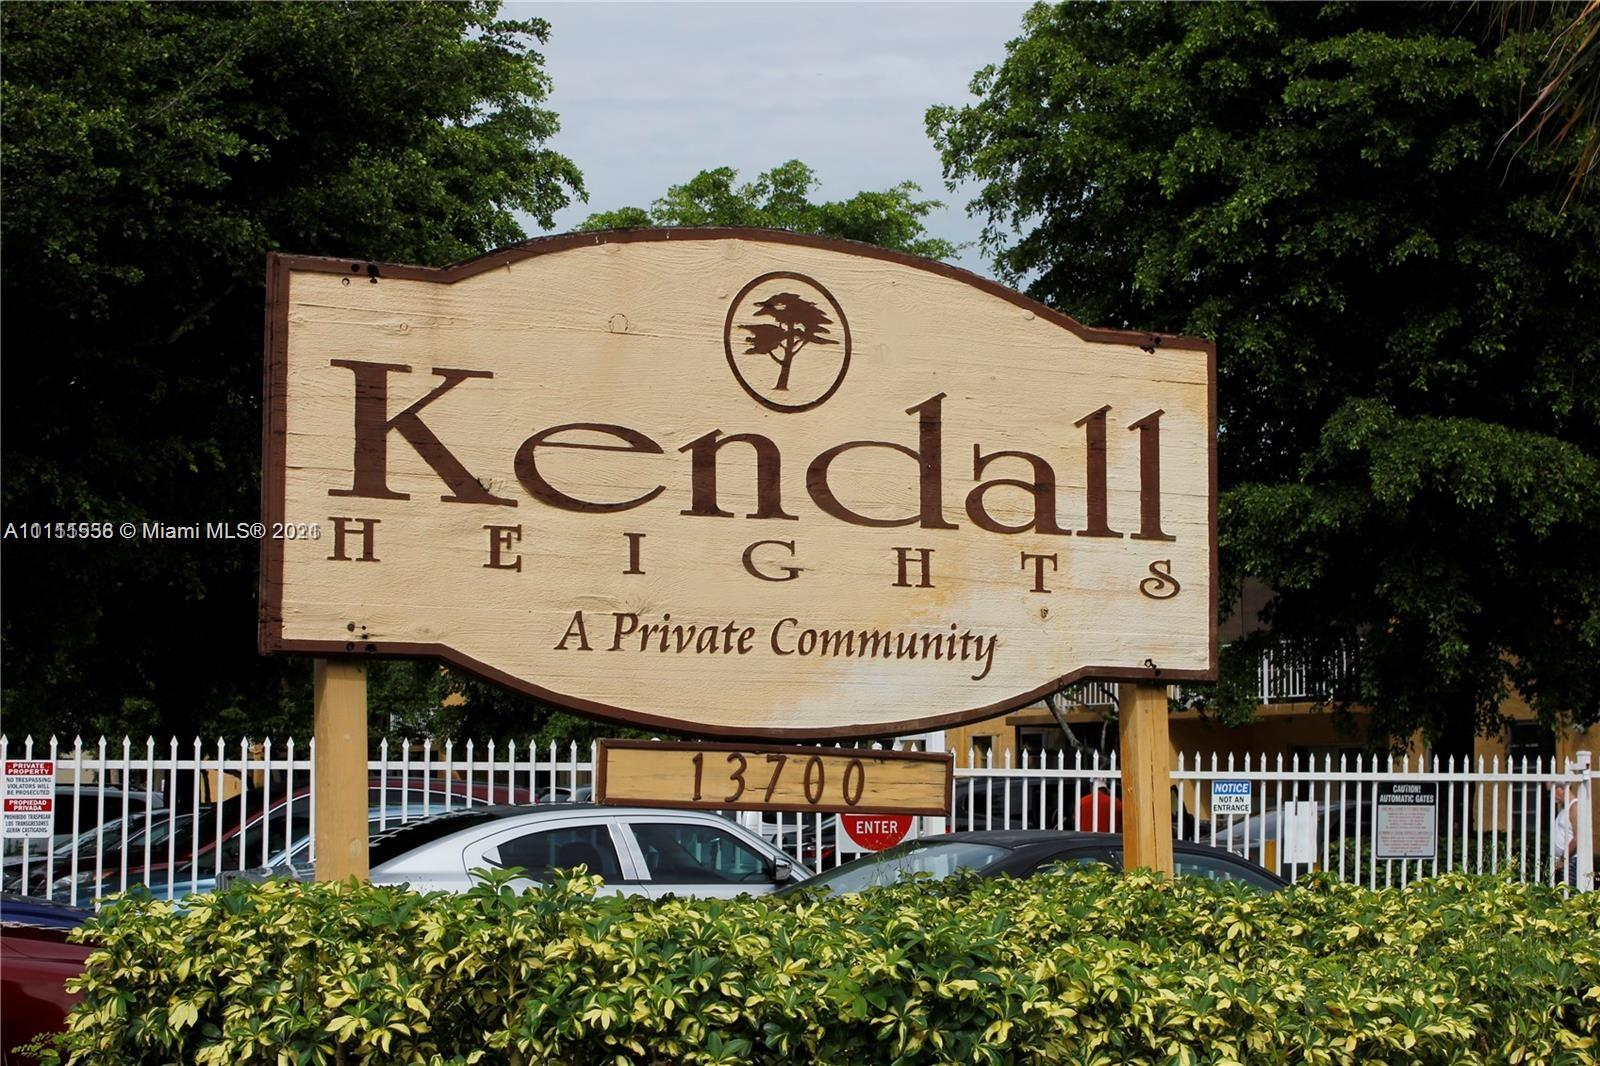 KENDALL HEIGHTS CONDO Condo,For Sale,KENDALL HEIGHTS CONDO Brickell,realty,broker,condos near me